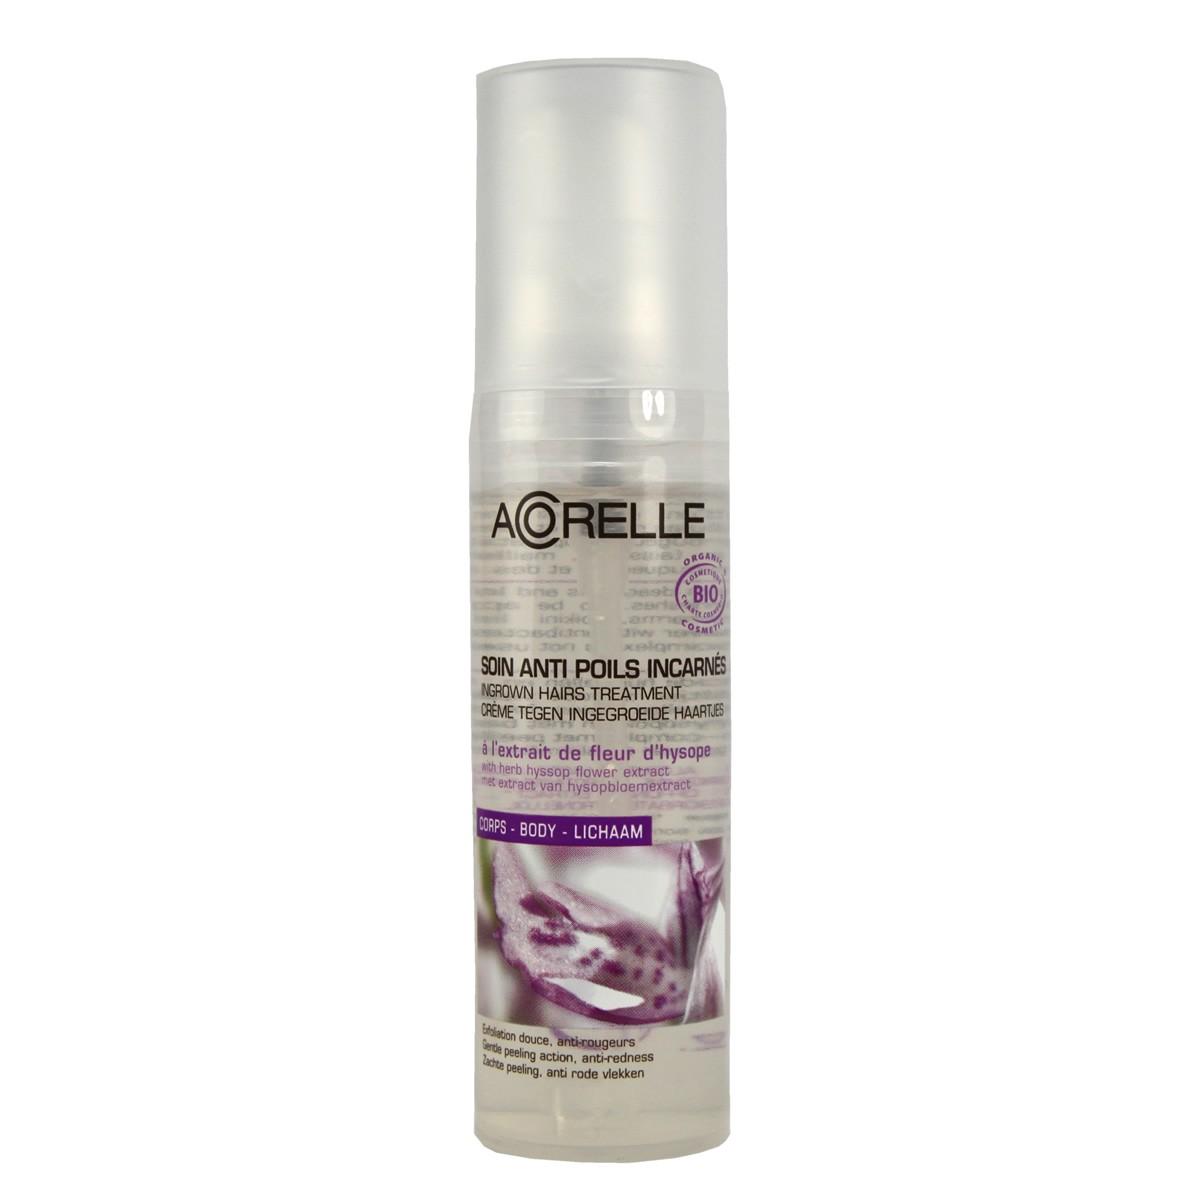 Acorelle Skin Care Ingrown Hair Treatment